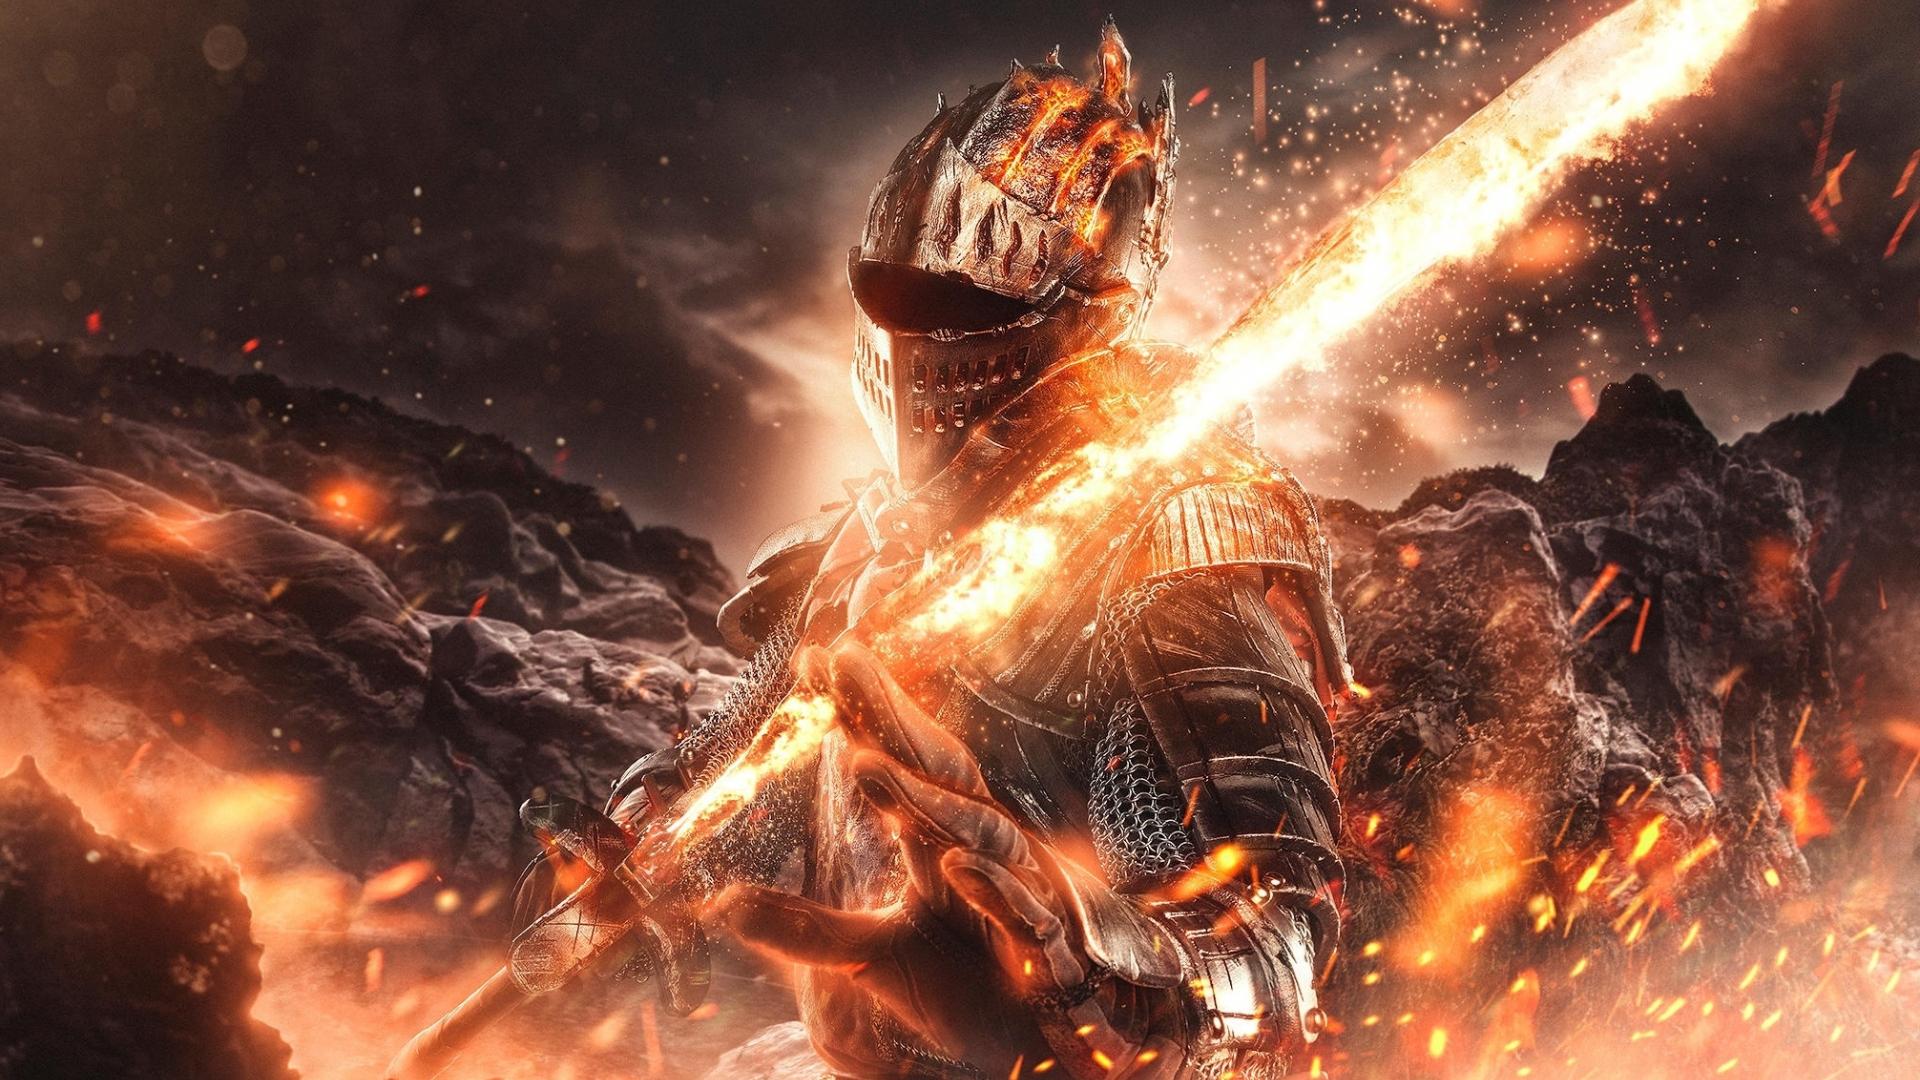 Download 1920x1080 Wallpaper Fire And Sword Dark Souls Video